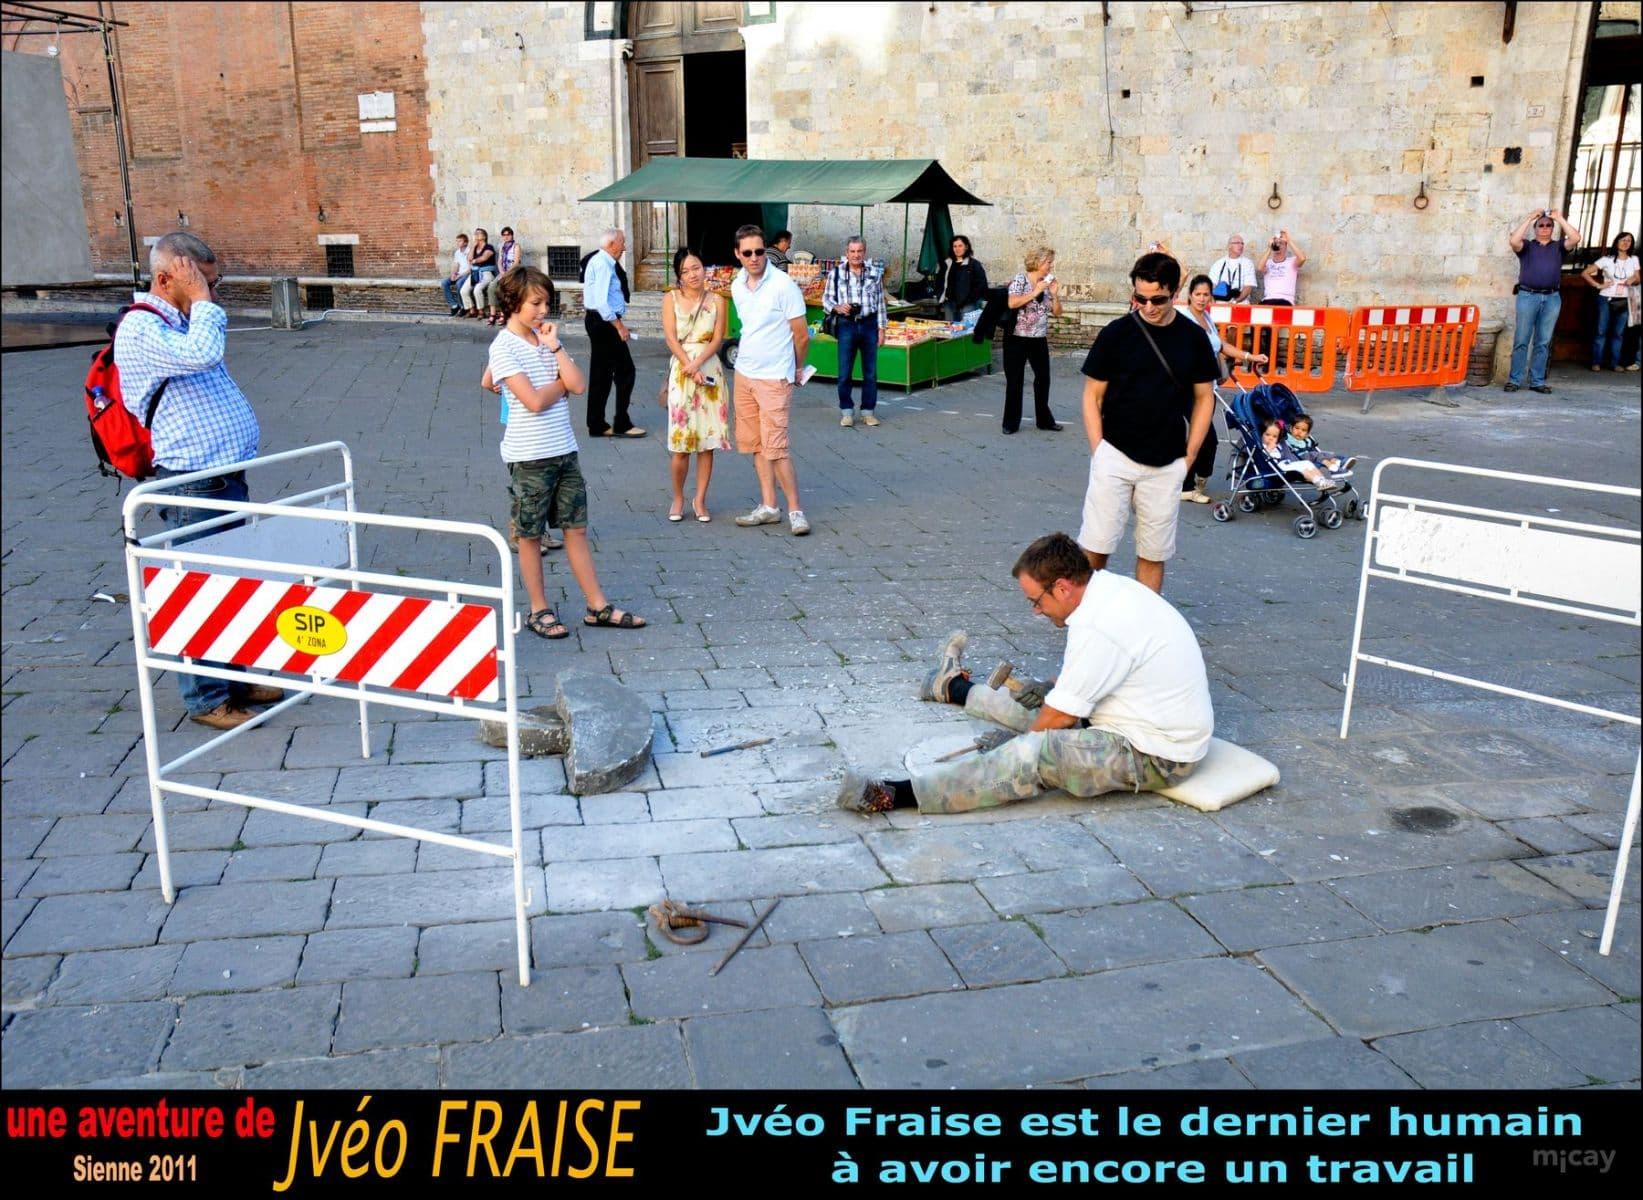 MichelAycaguer-JveoFraise-streetphotography-10